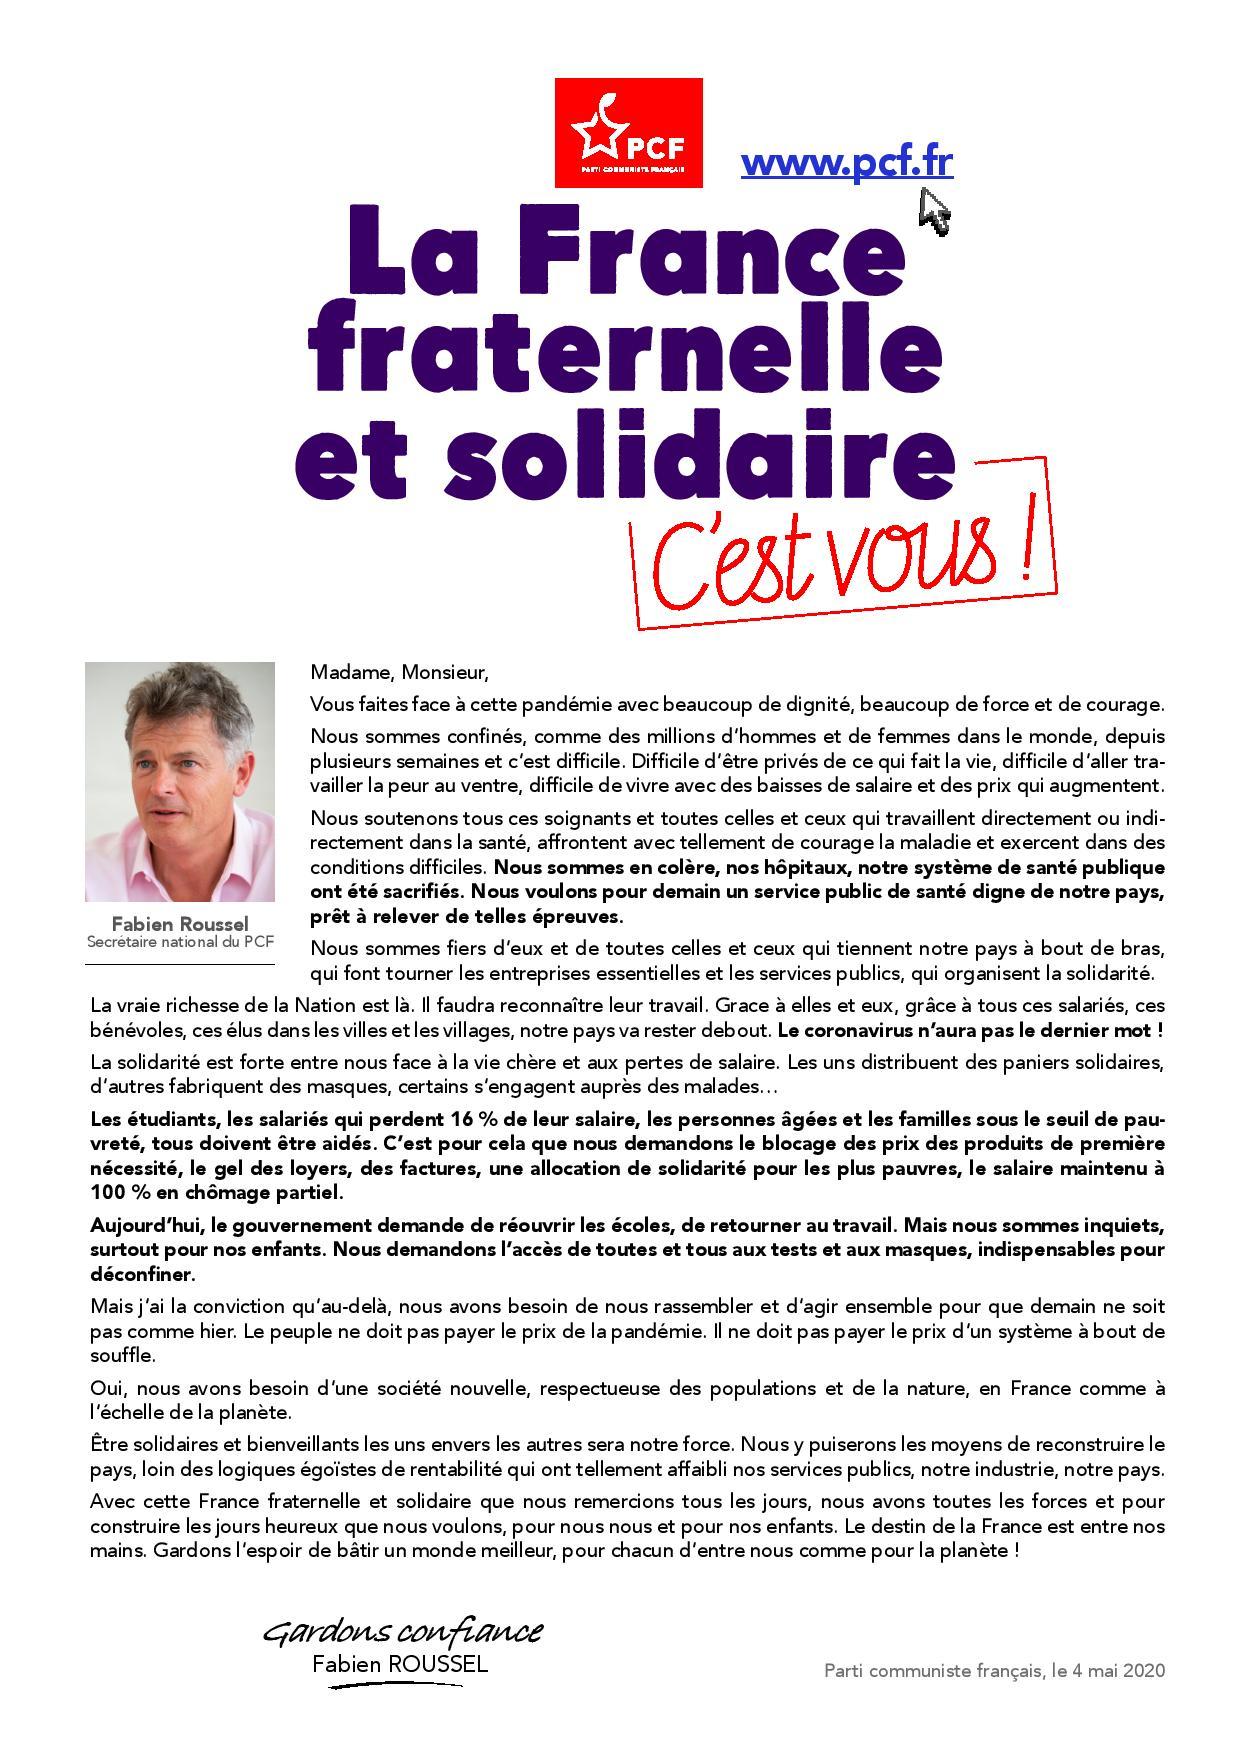 20200506_lettre_francais_coul_.jpg